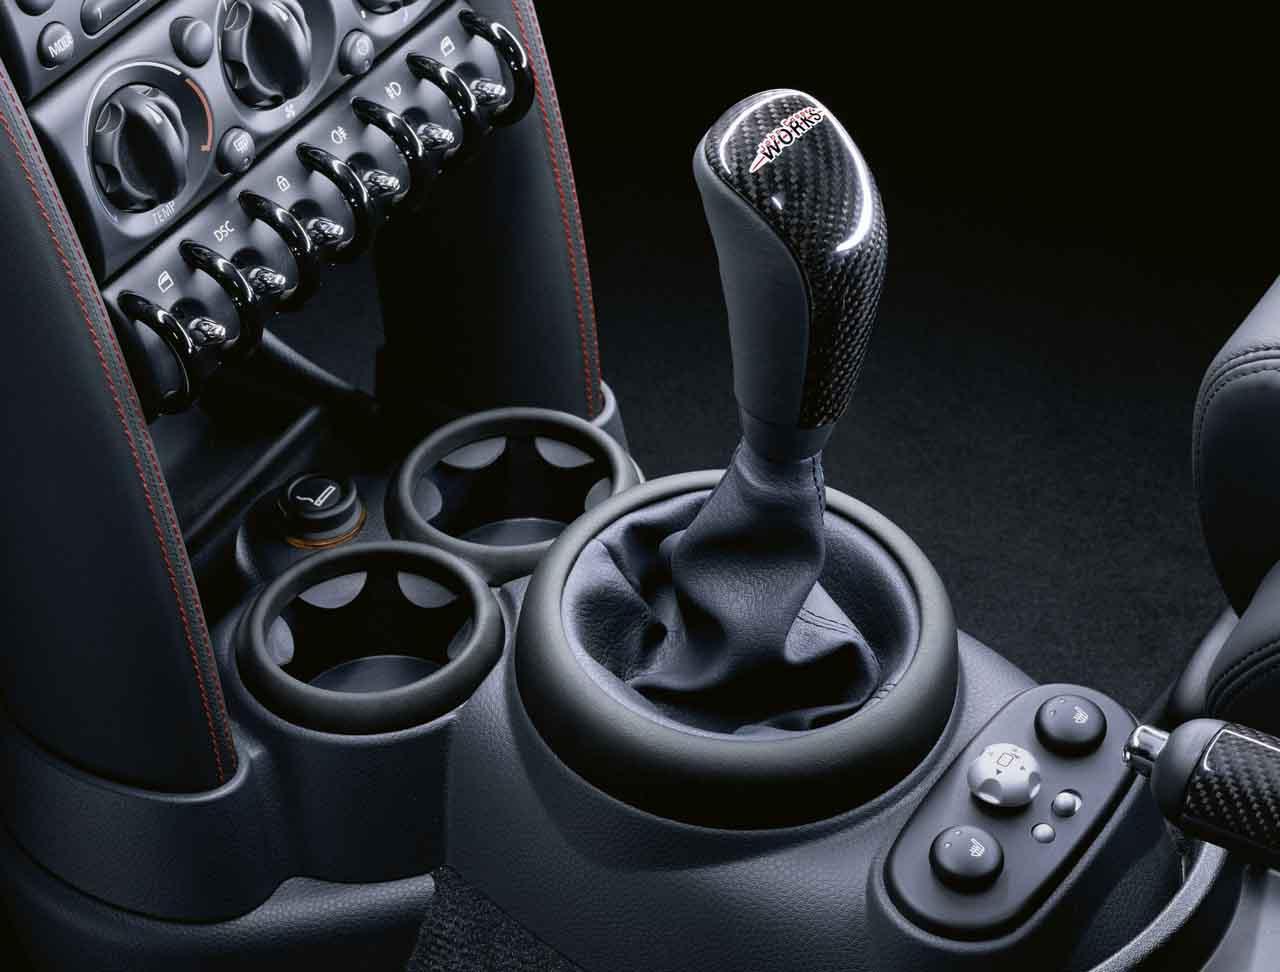 Mini Genuine Jcw Gear Shift Stick Knob Leather Carbon R50